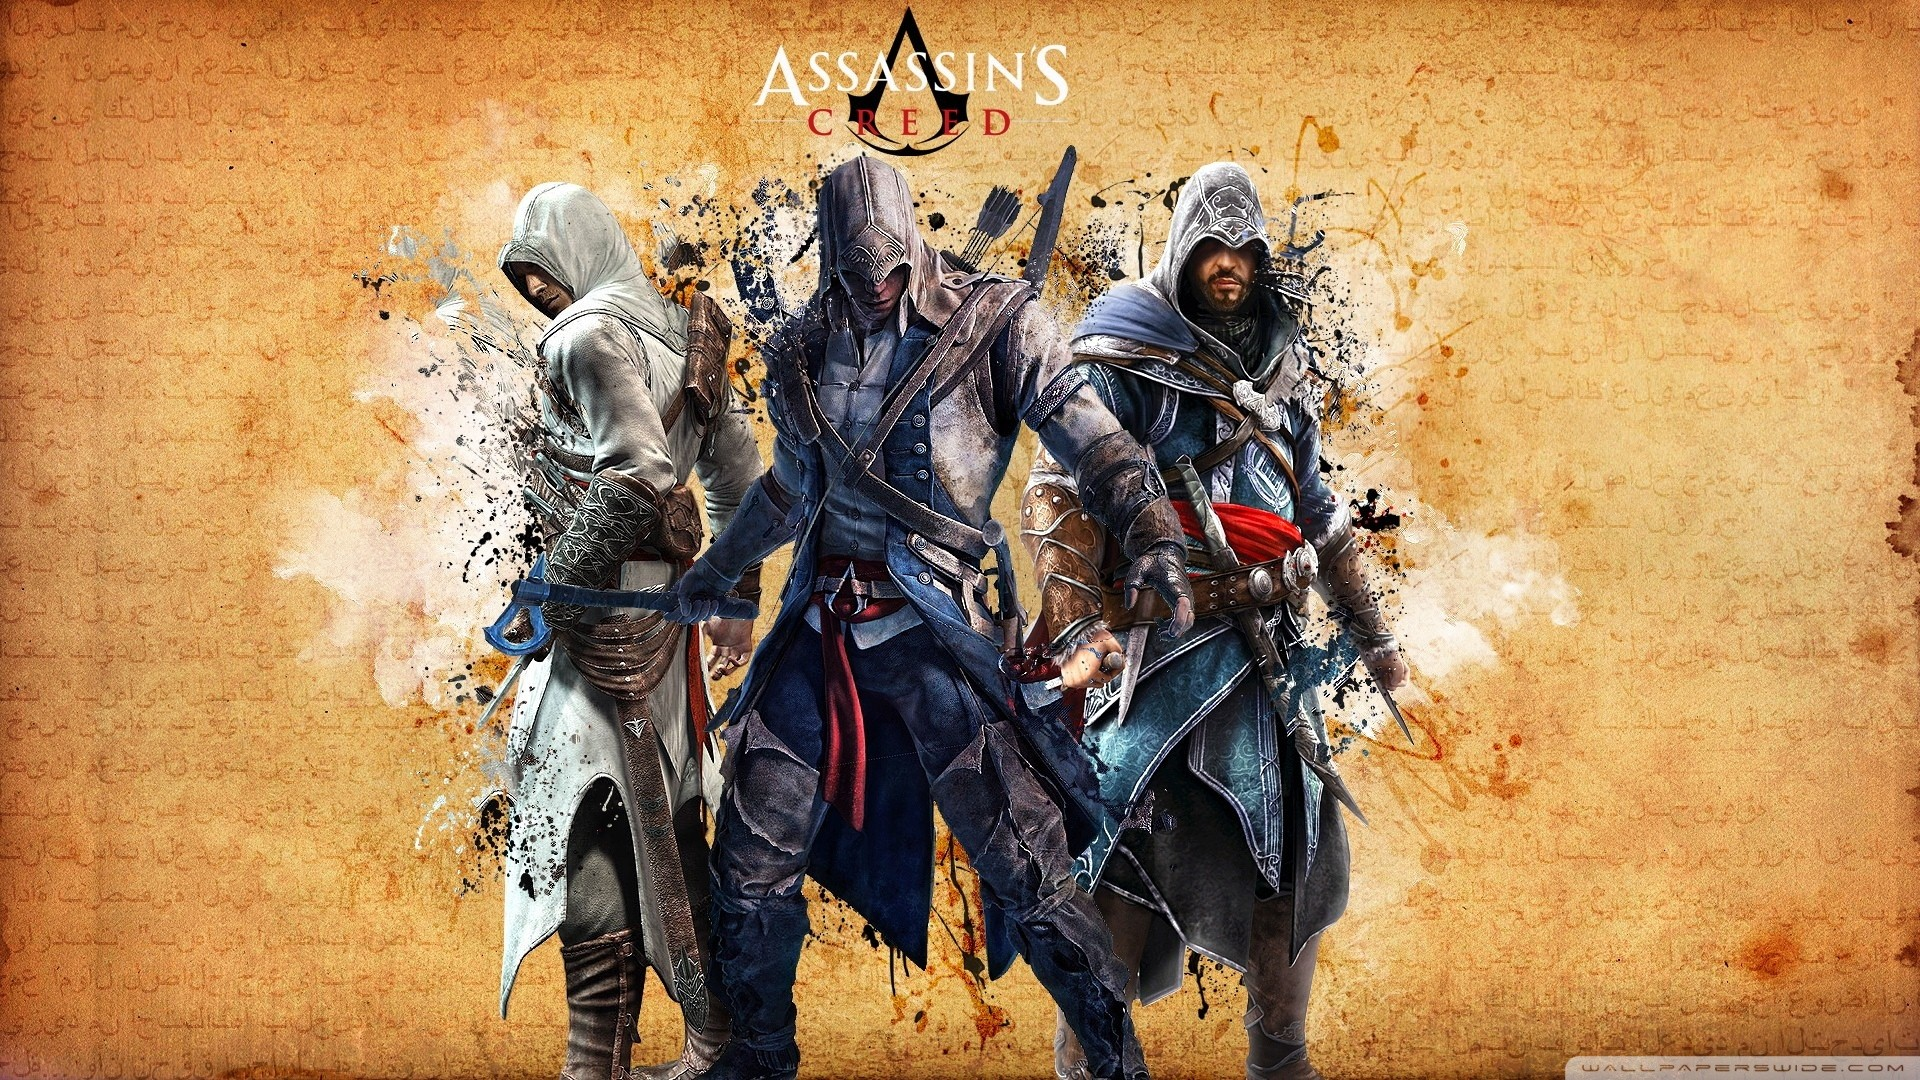 assassins creed 3 wallpaper 1920x1080 80 images